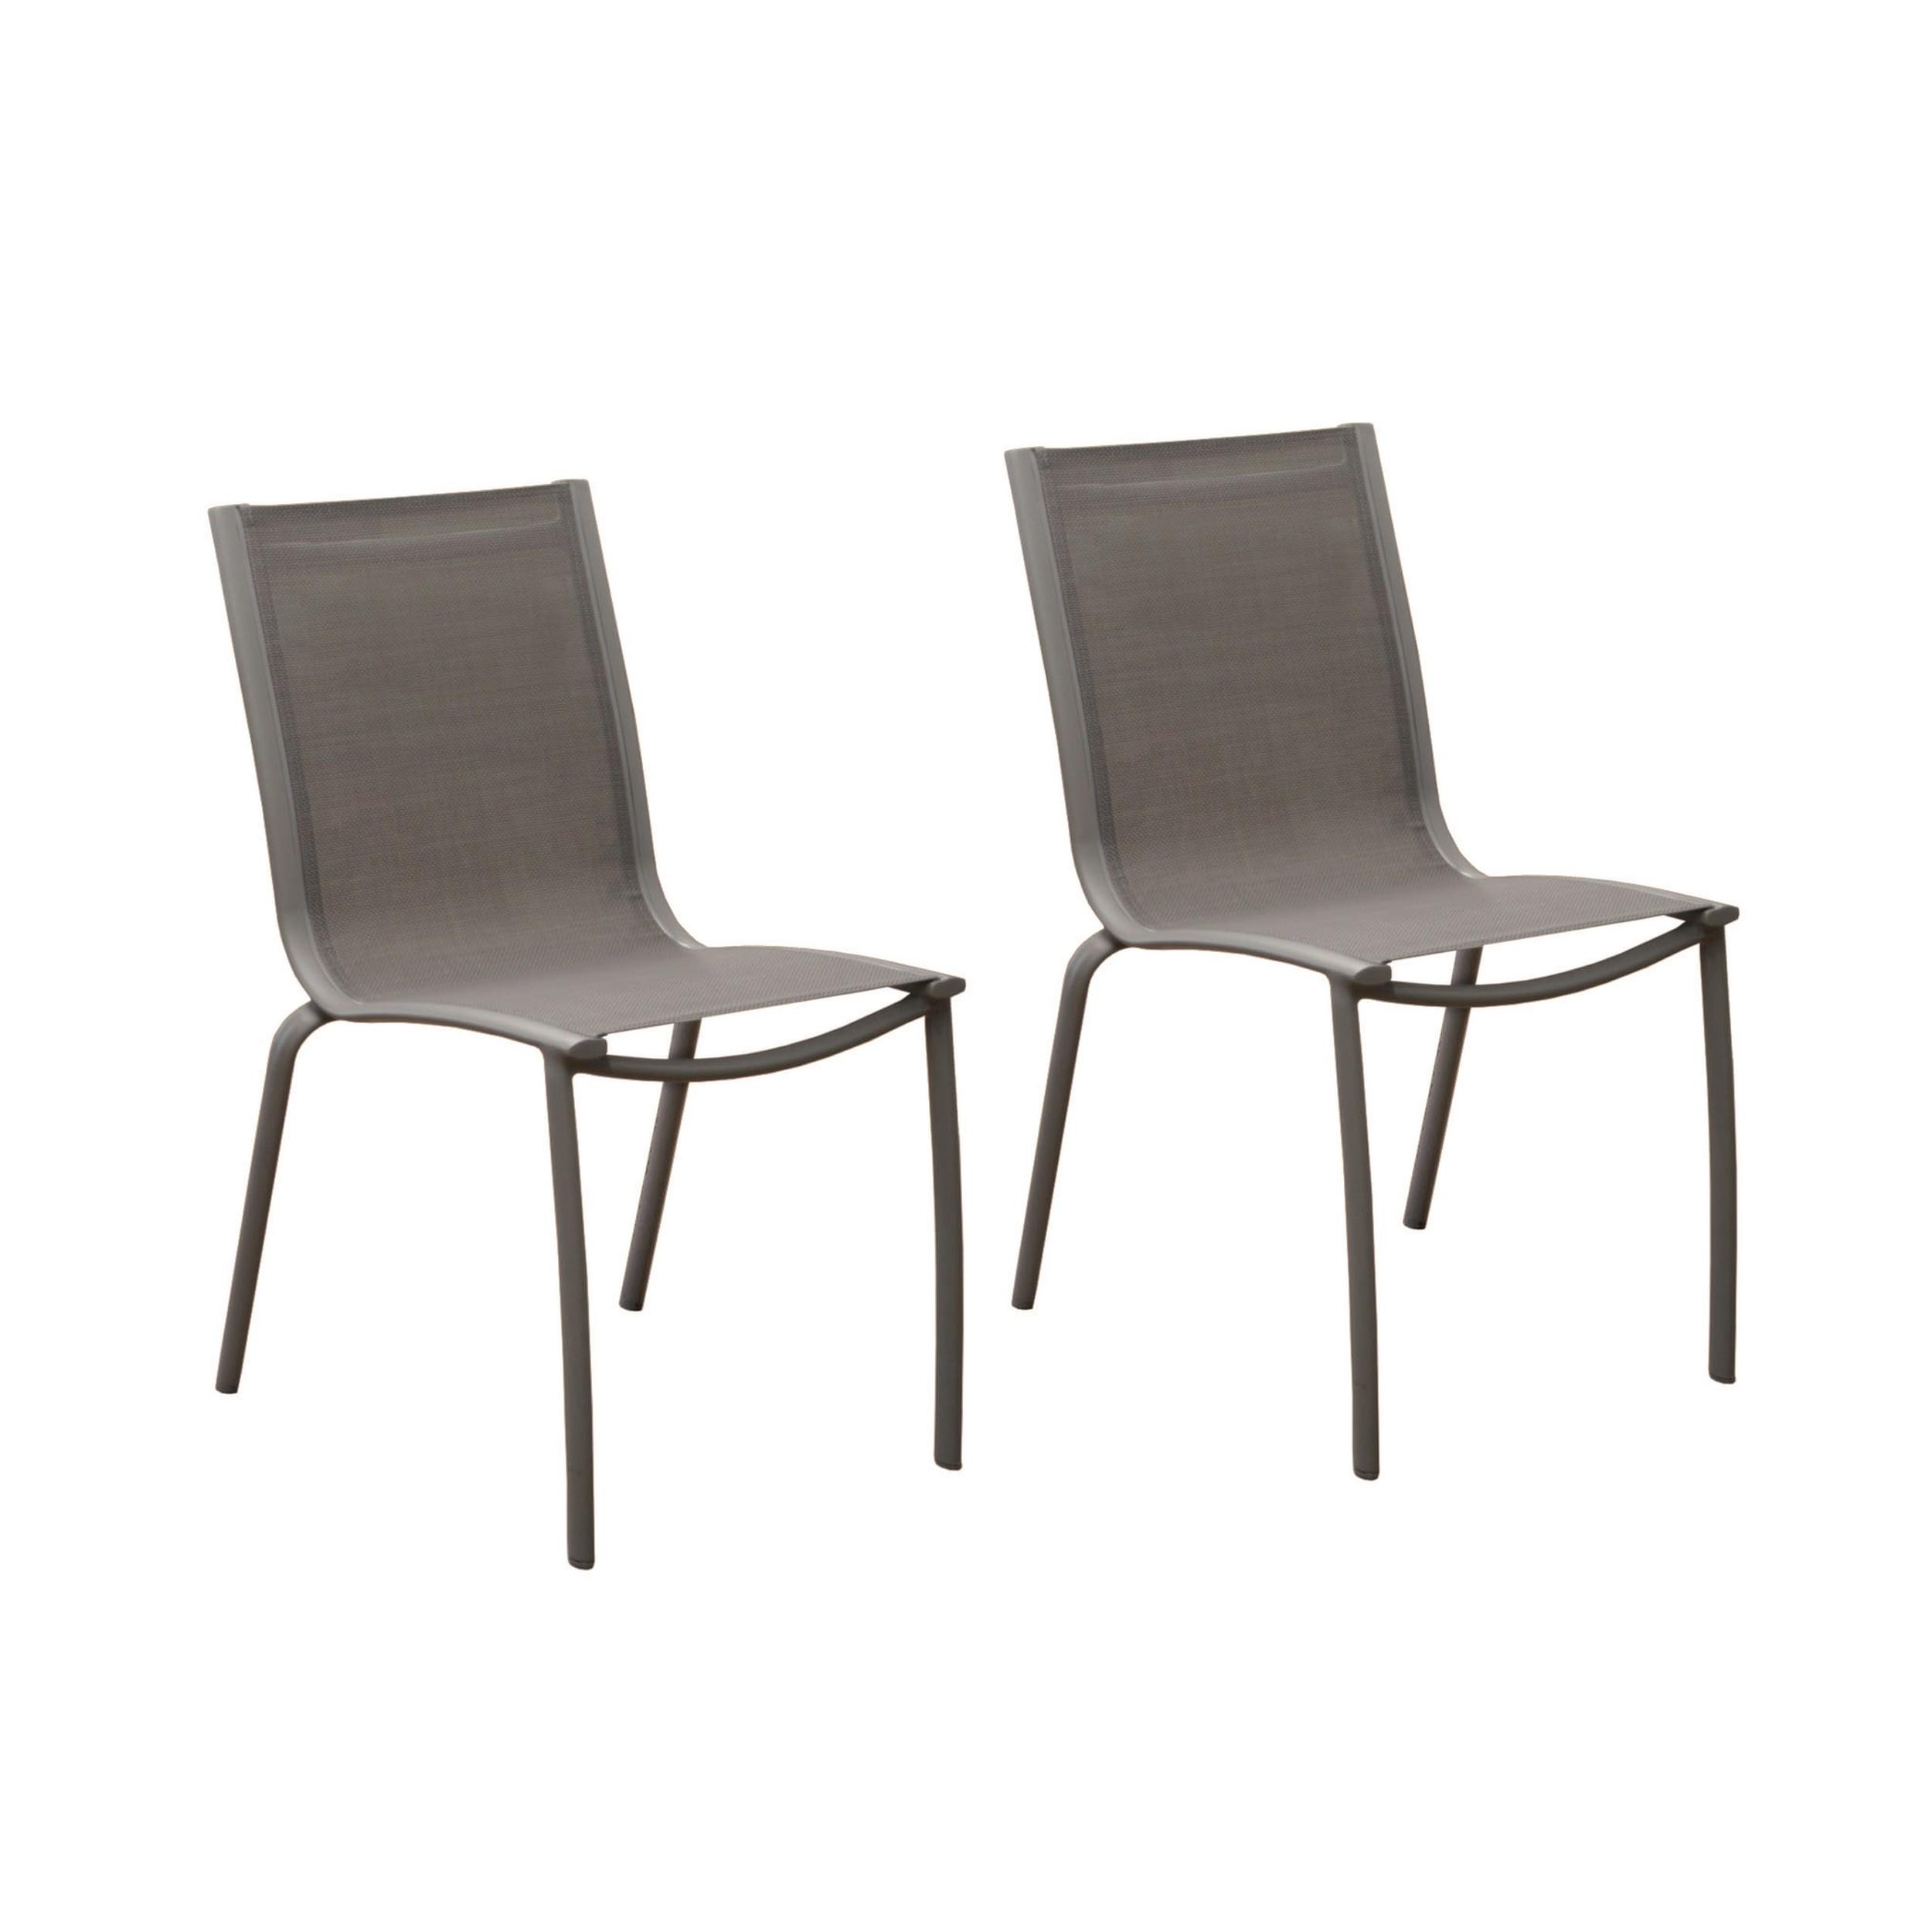 chaise de jardin santa rosa taupe lot de2 commandez nos chaises de jardin santa rosa taupe. Black Bedroom Furniture Sets. Home Design Ideas